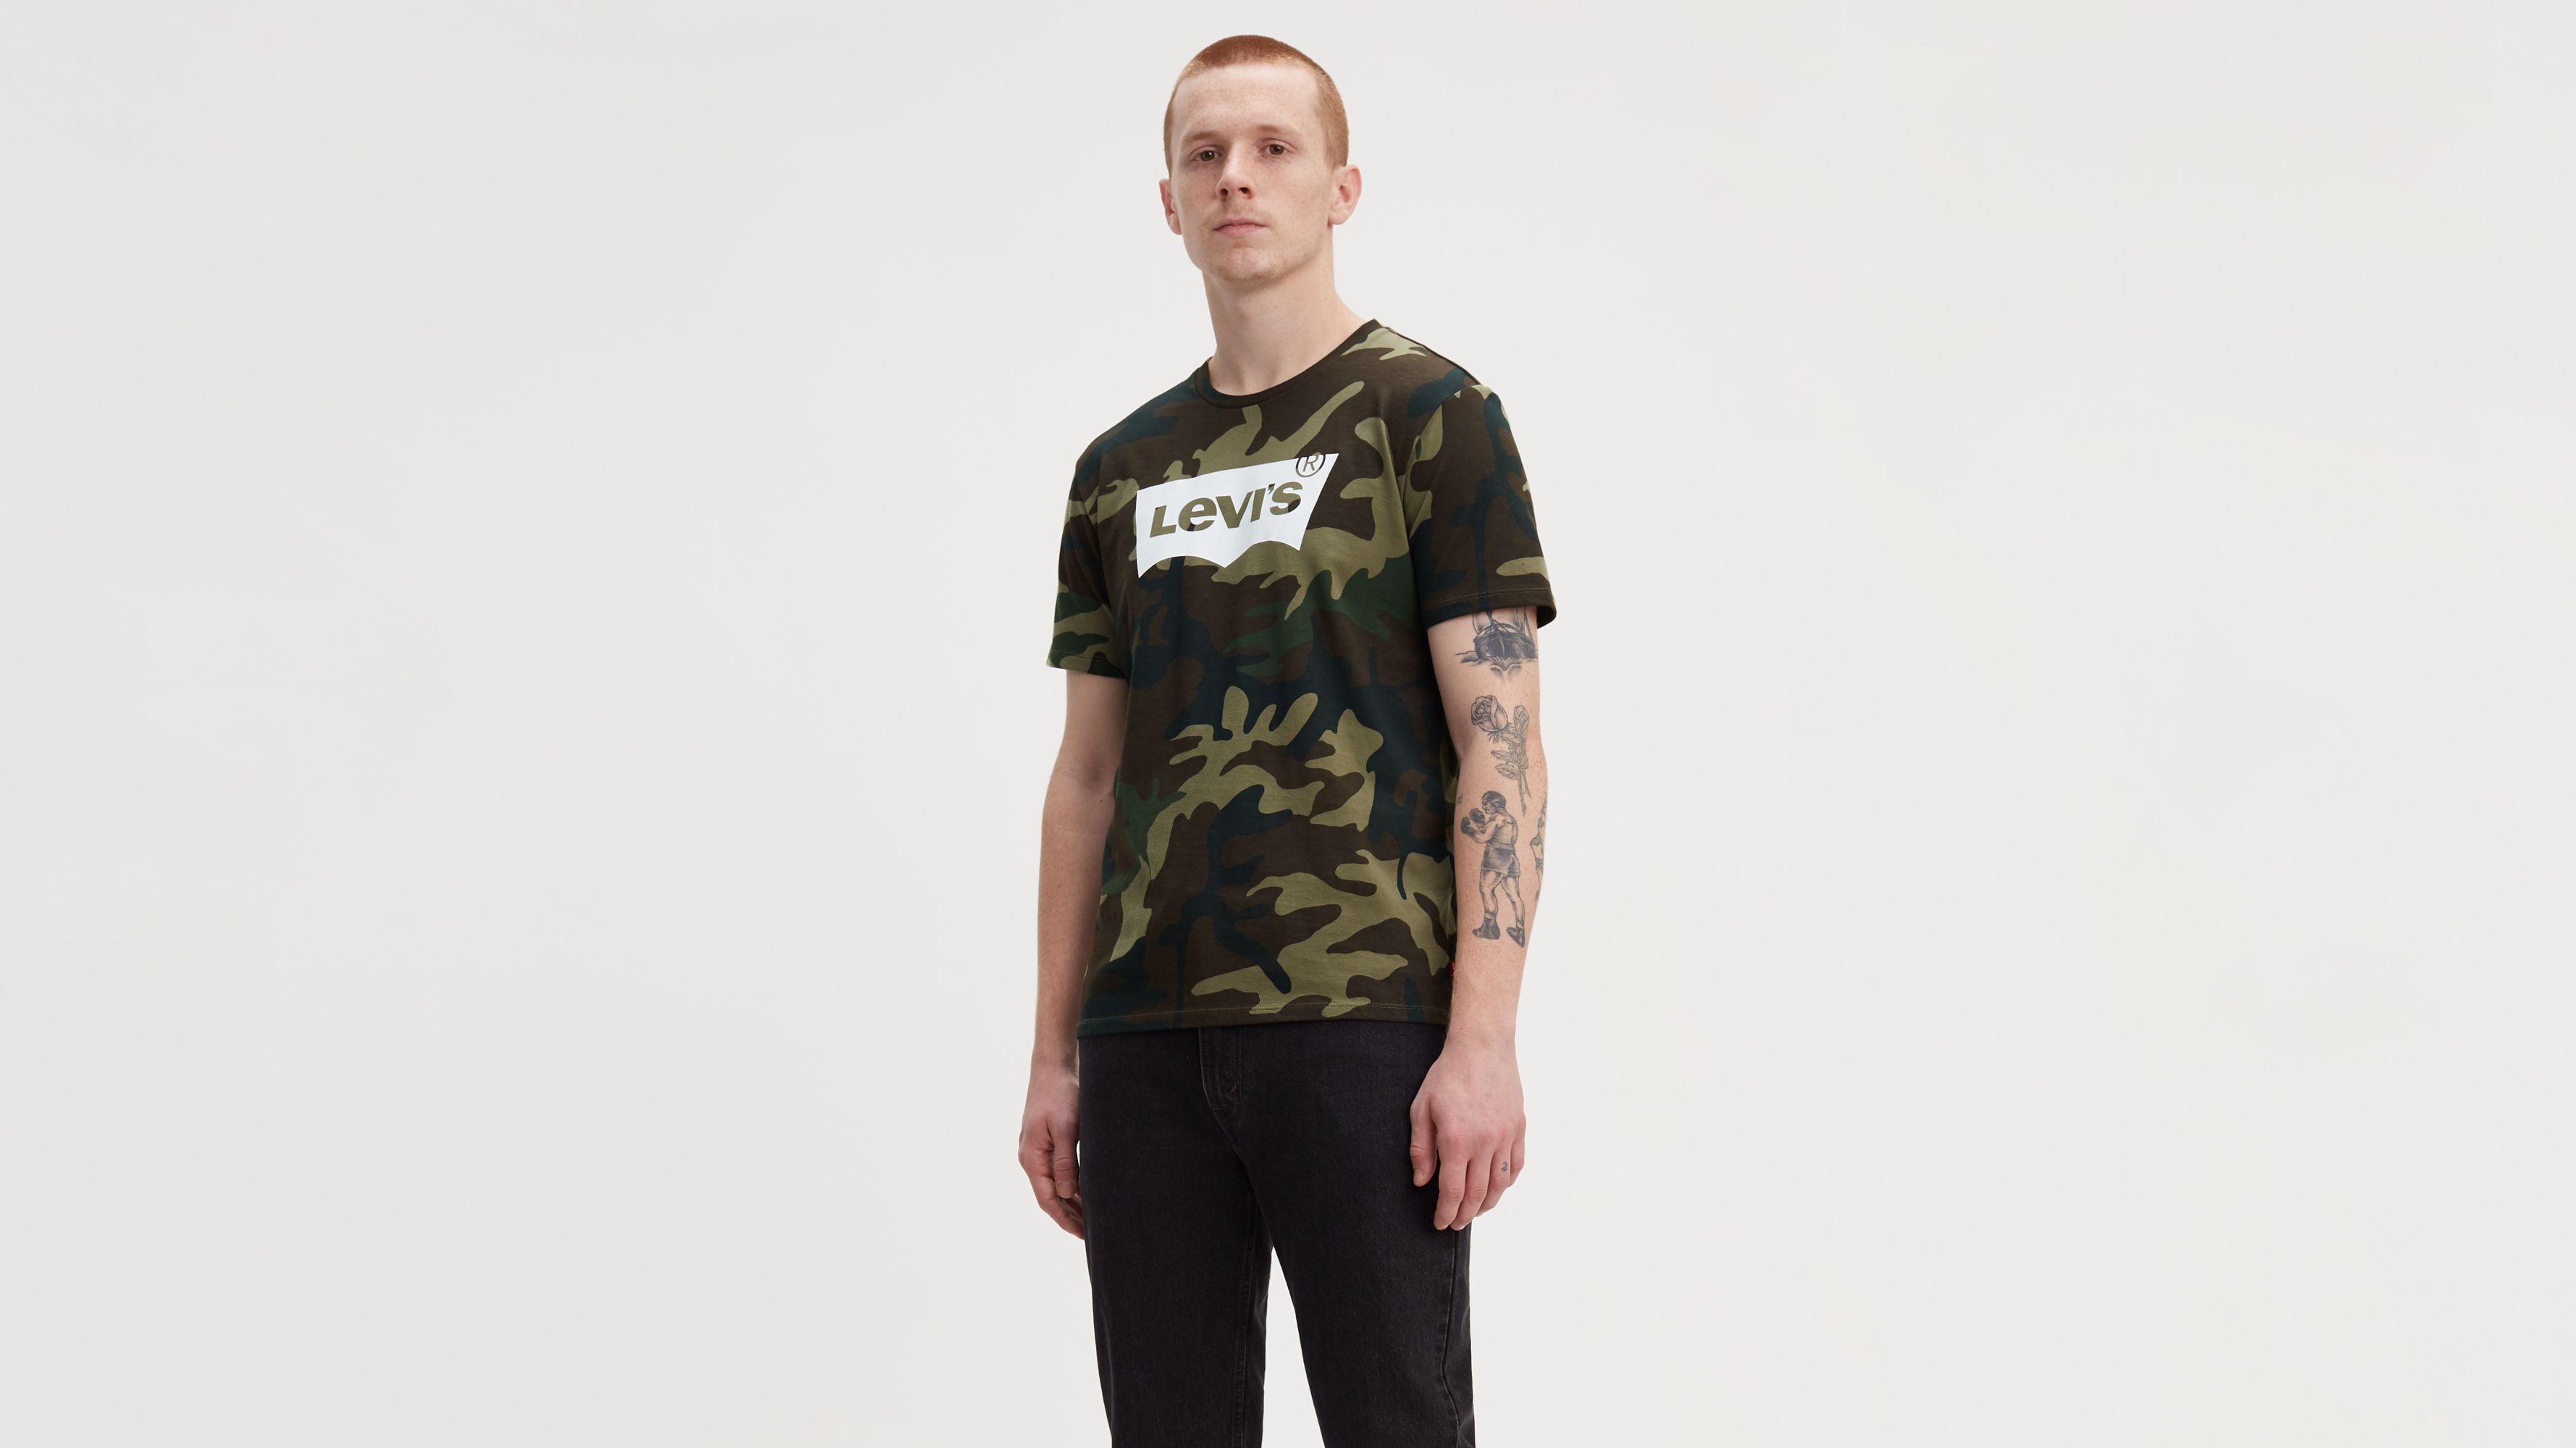 Tee Shop Shirts Us Graphic TLevi's® Men's 4ARj3LSc5q